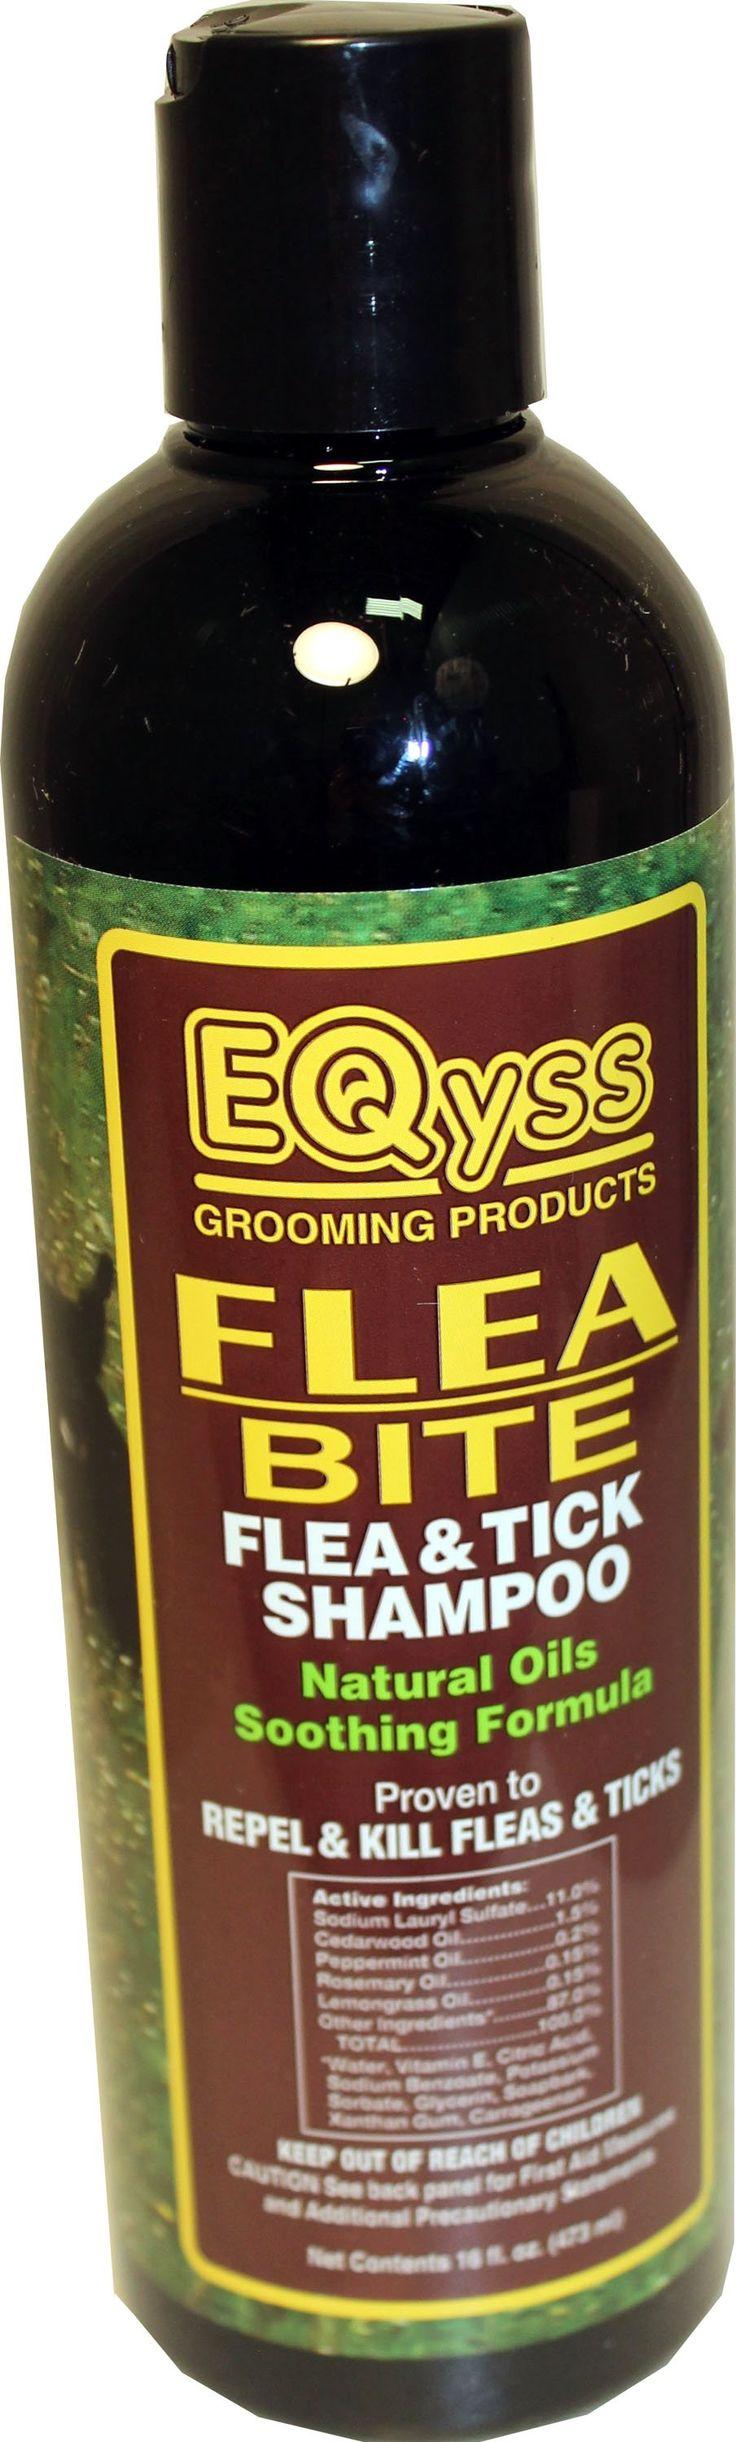 Eqyss Grooming Prod D-Flea Bite Shampoo 16 Oz